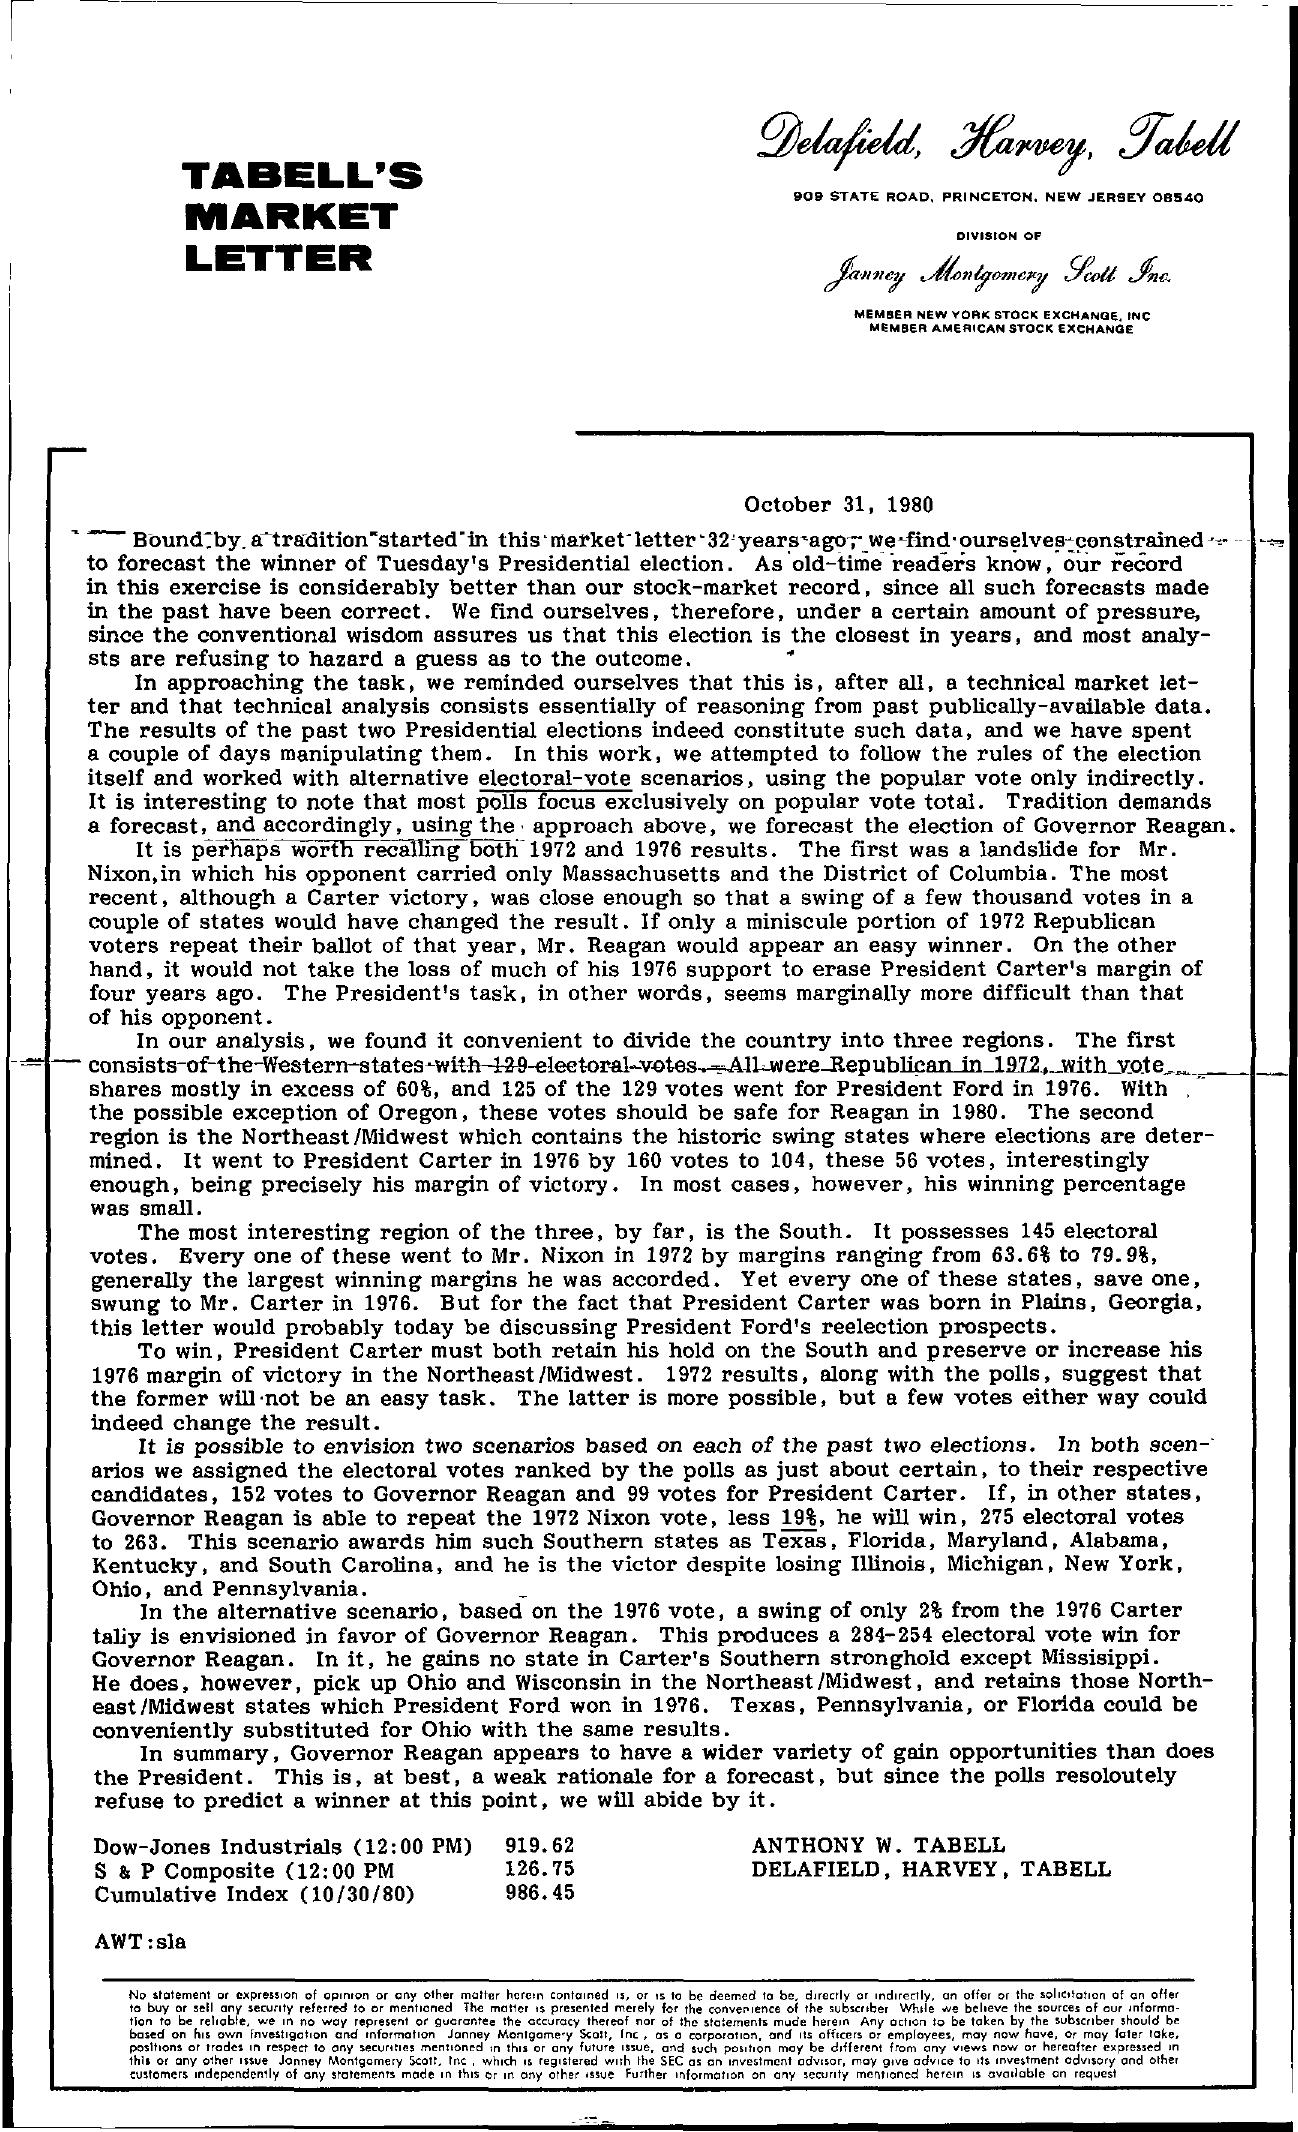 Tabell's Market Letter - October 31, 1980